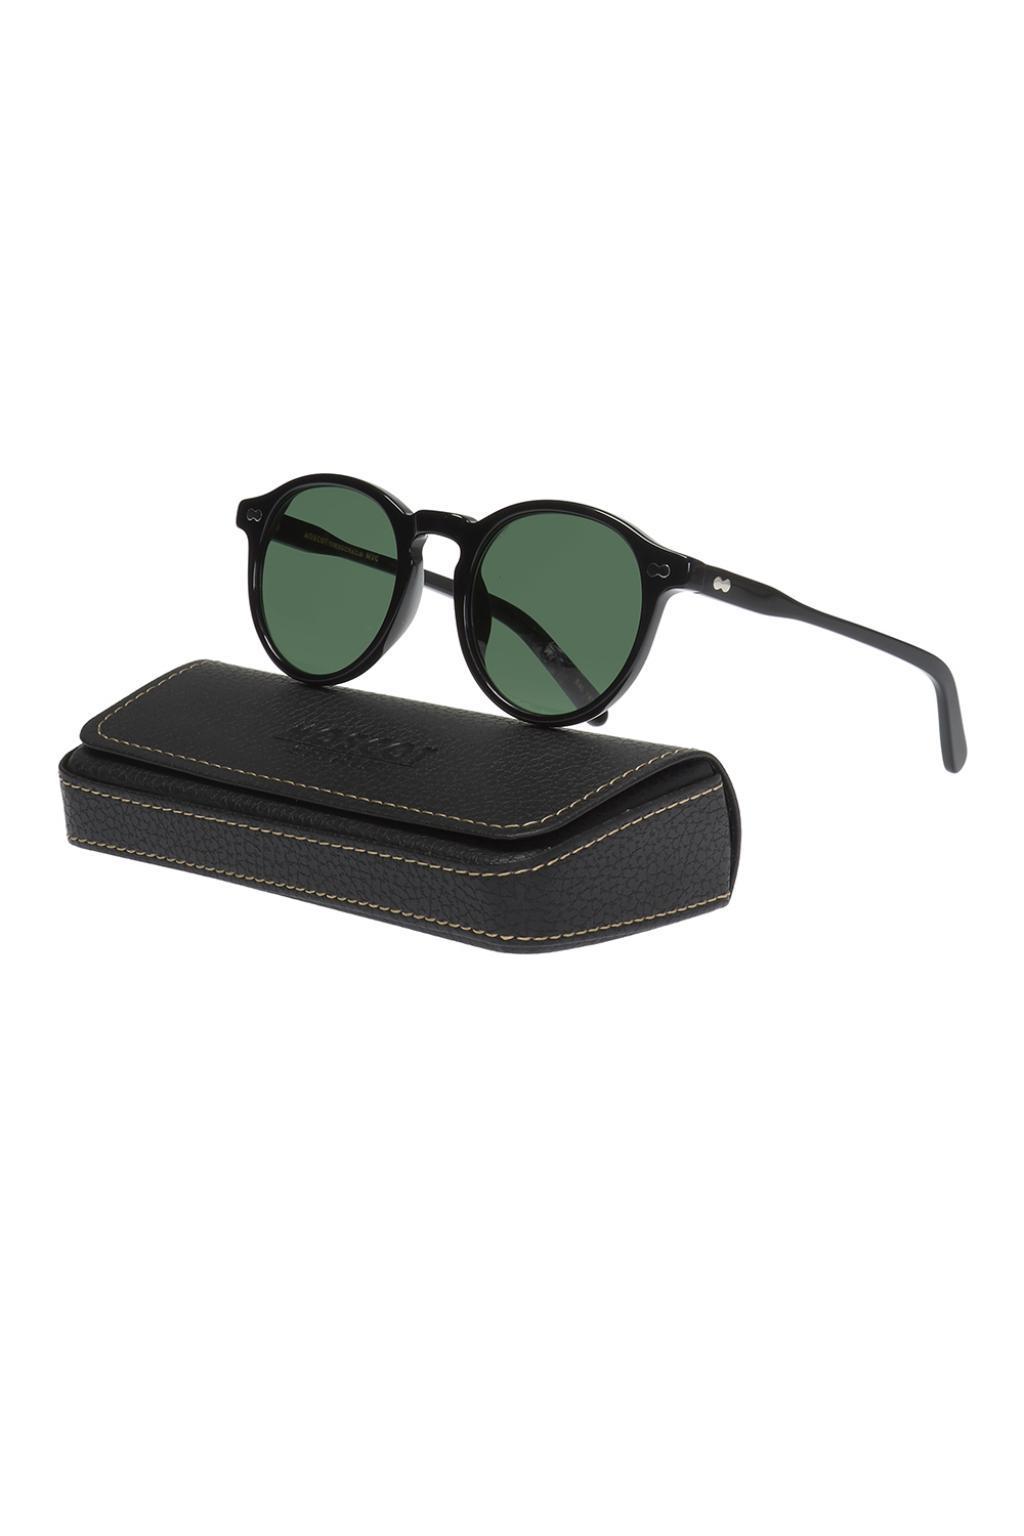 185a3f2622 Moscot  miltzen  Sunglasses in Black for Men - Lyst